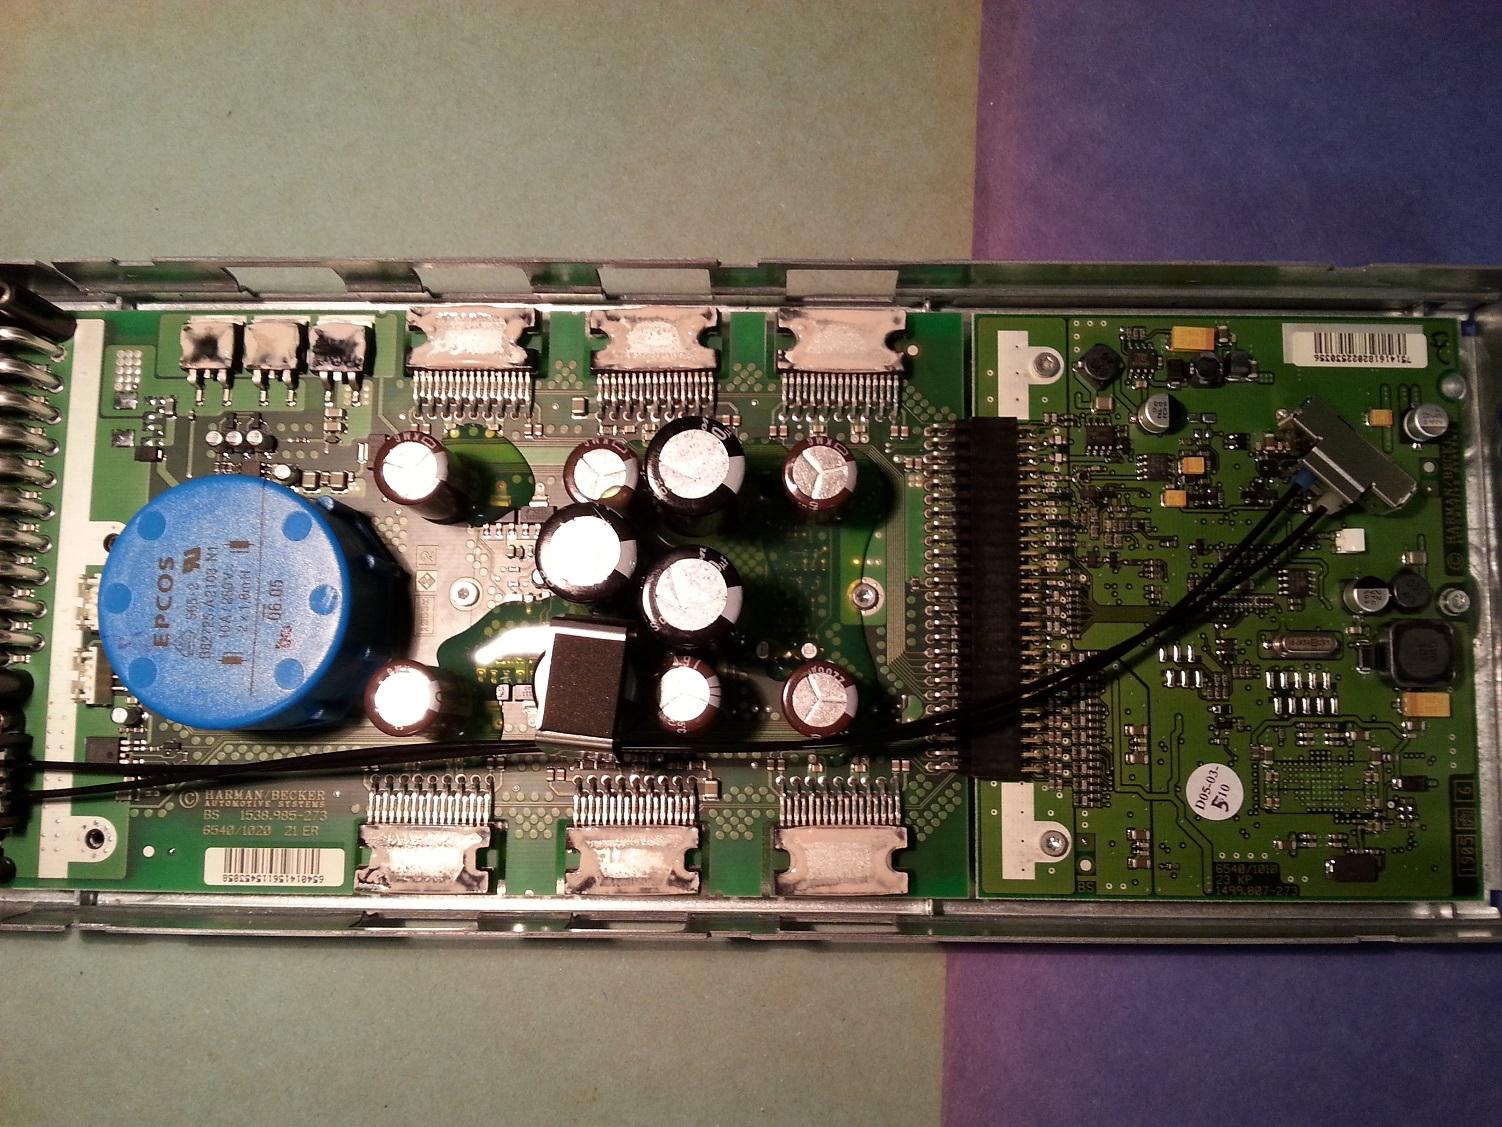 diy logic 7 amp repair. Black Bedroom Furniture Sets. Home Design Ideas